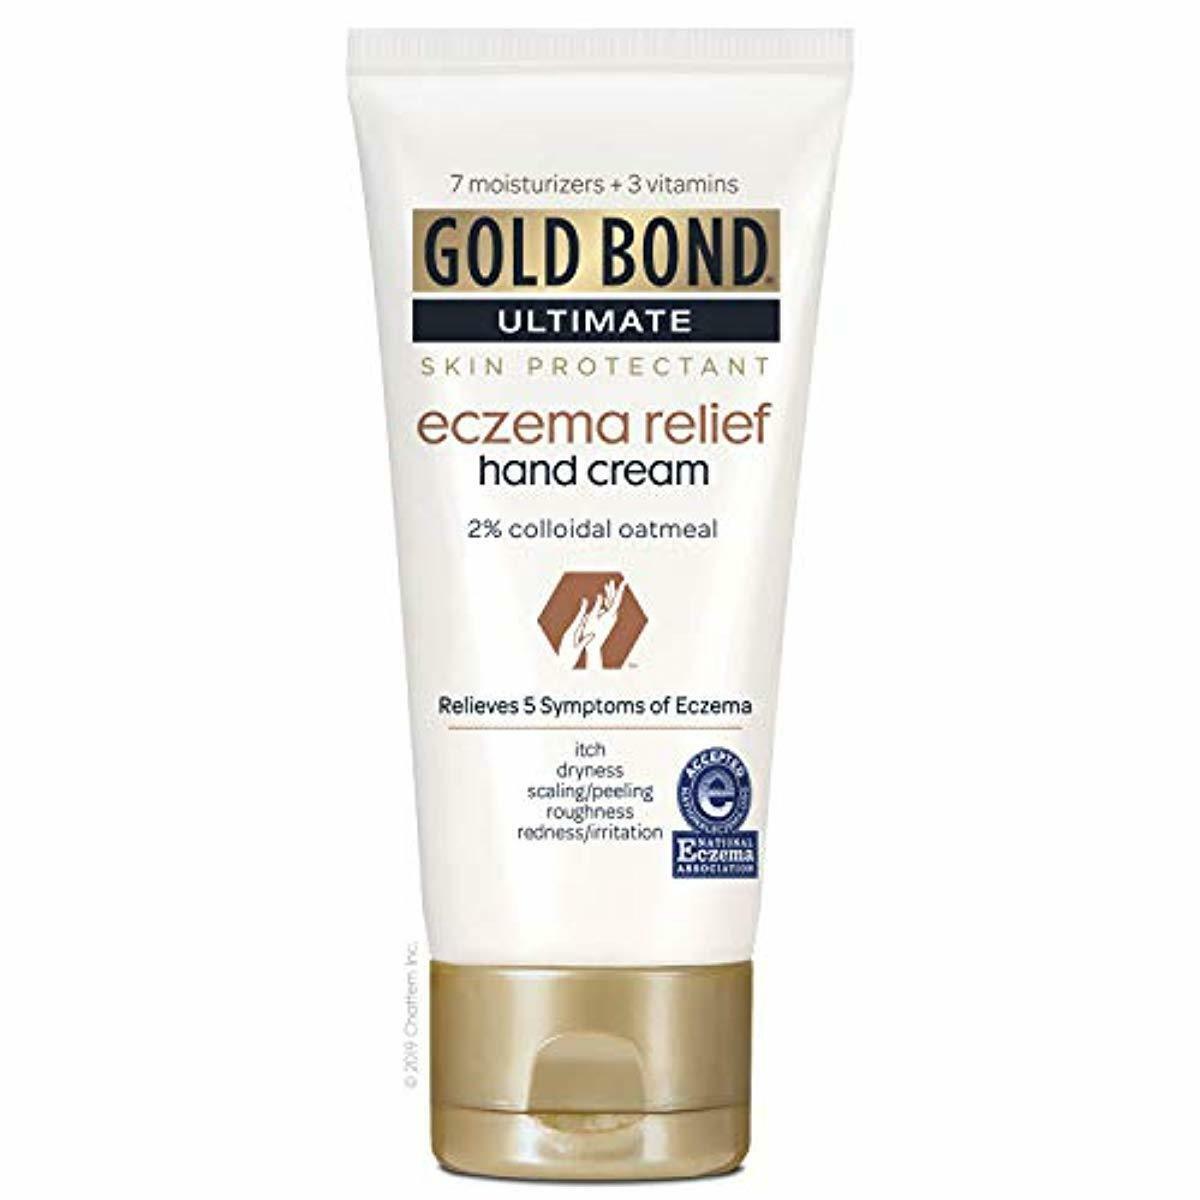 gold bond eczema relief hand cream 3